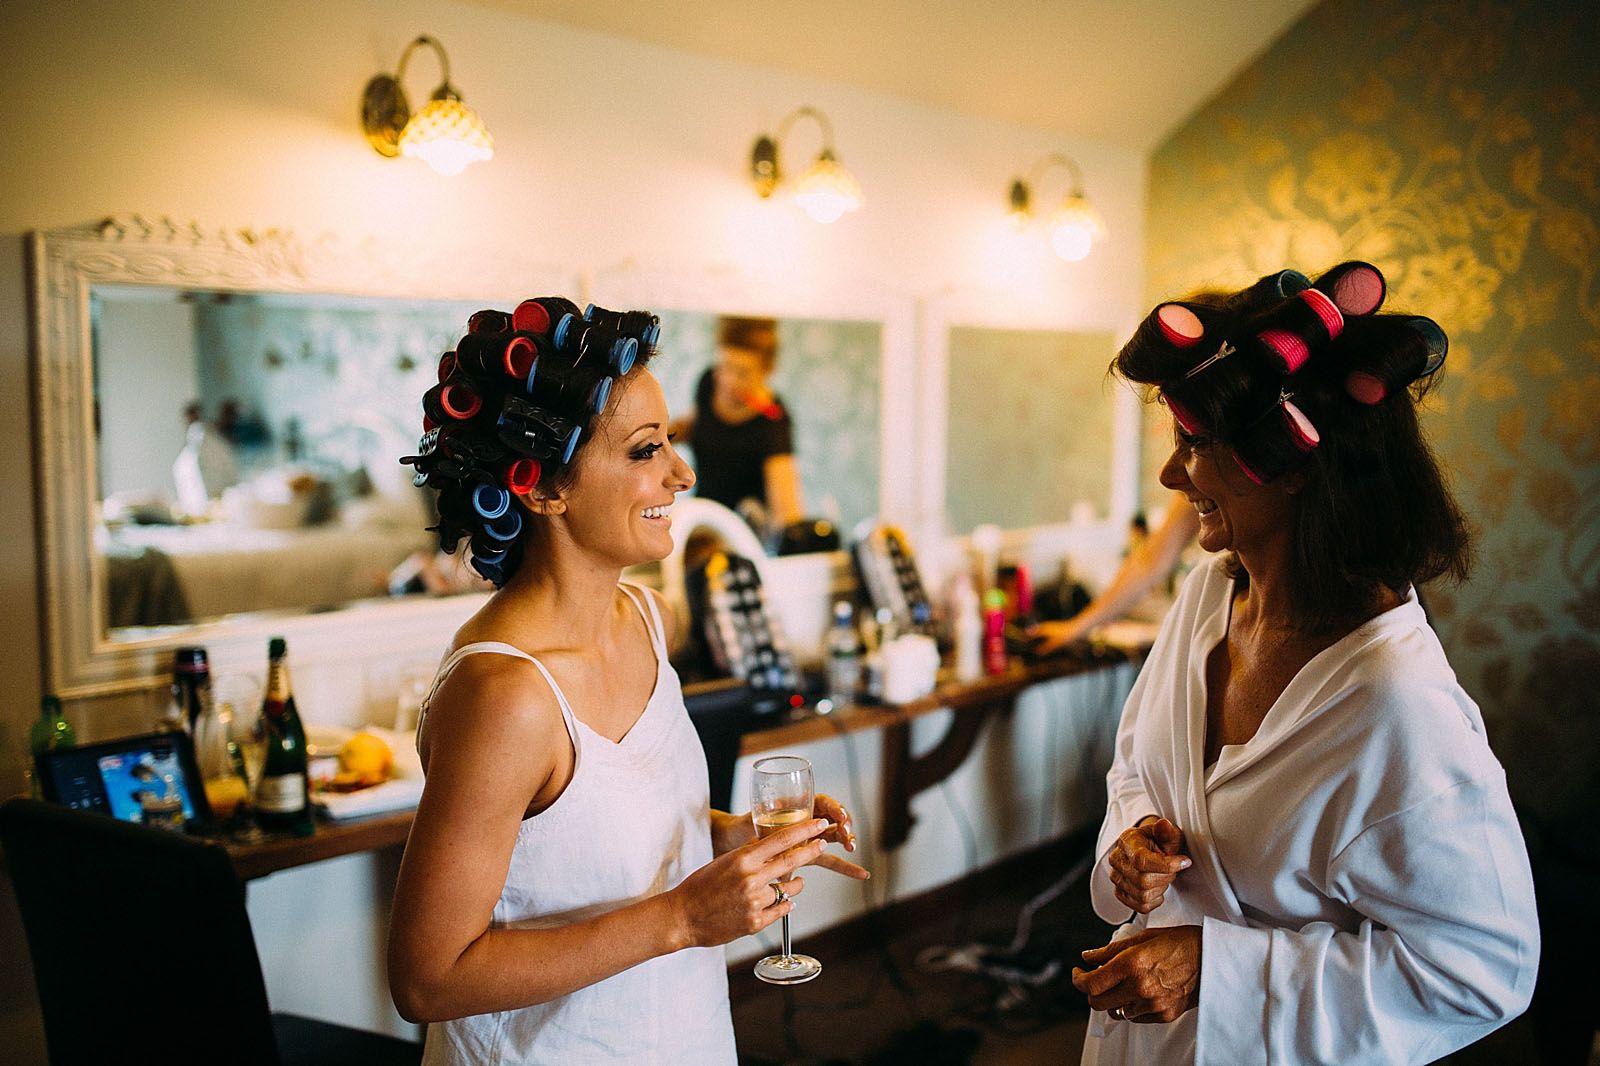 Heaton House Farm Wedding Venue Cheshire Lawson Photography Bridal Preparation Room